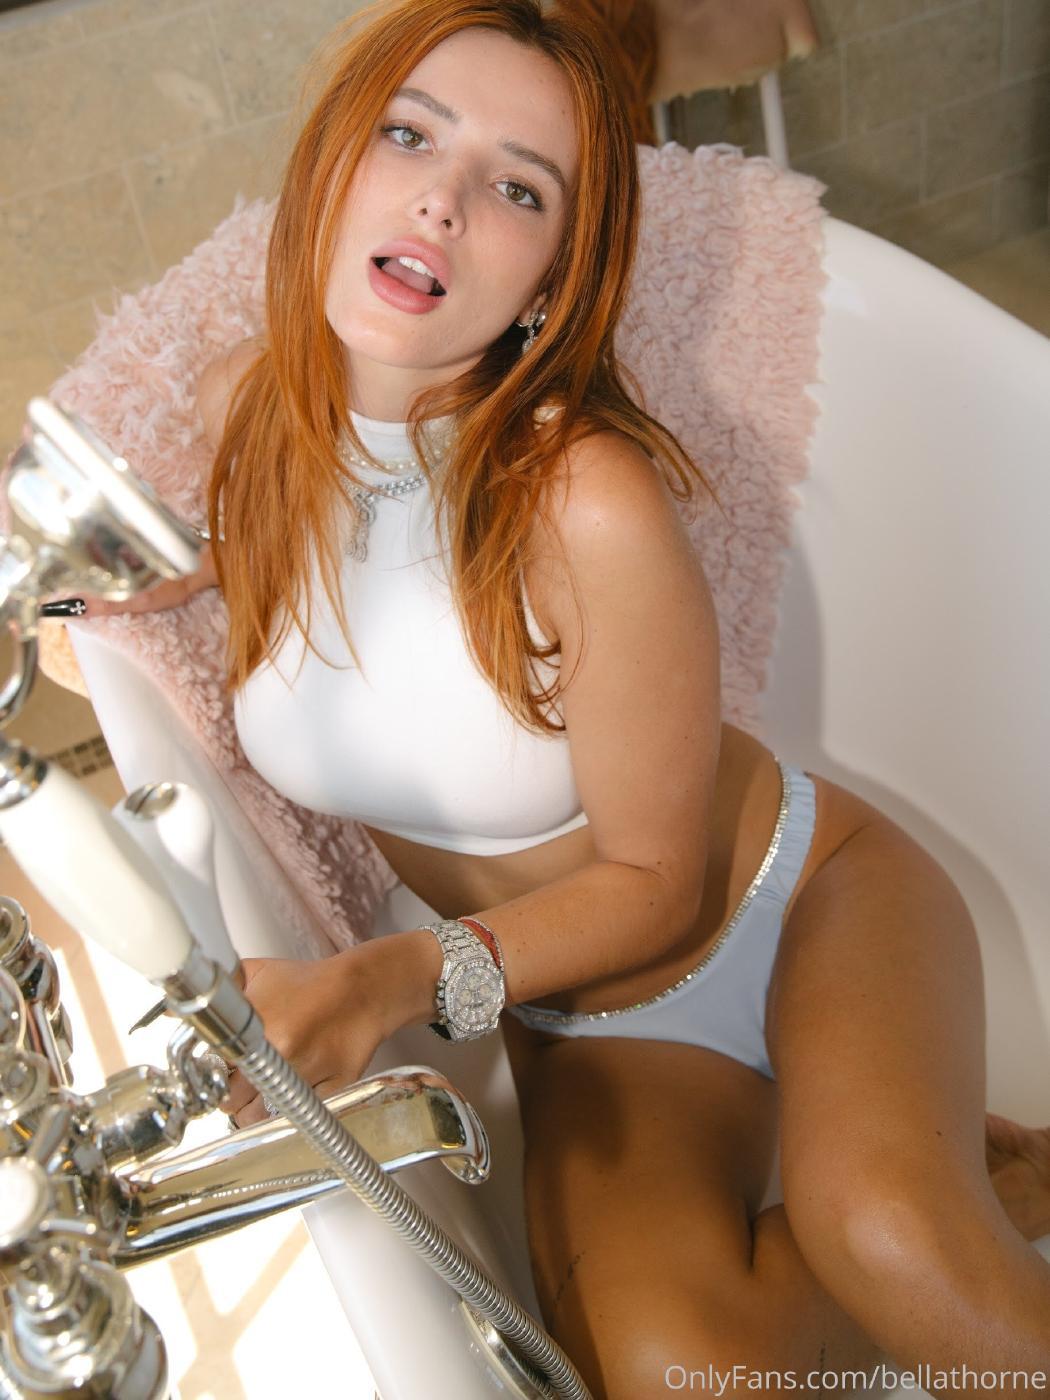 Bella Thorne Bikini Bathub Onlyfans Set Leaked Dzzbxy